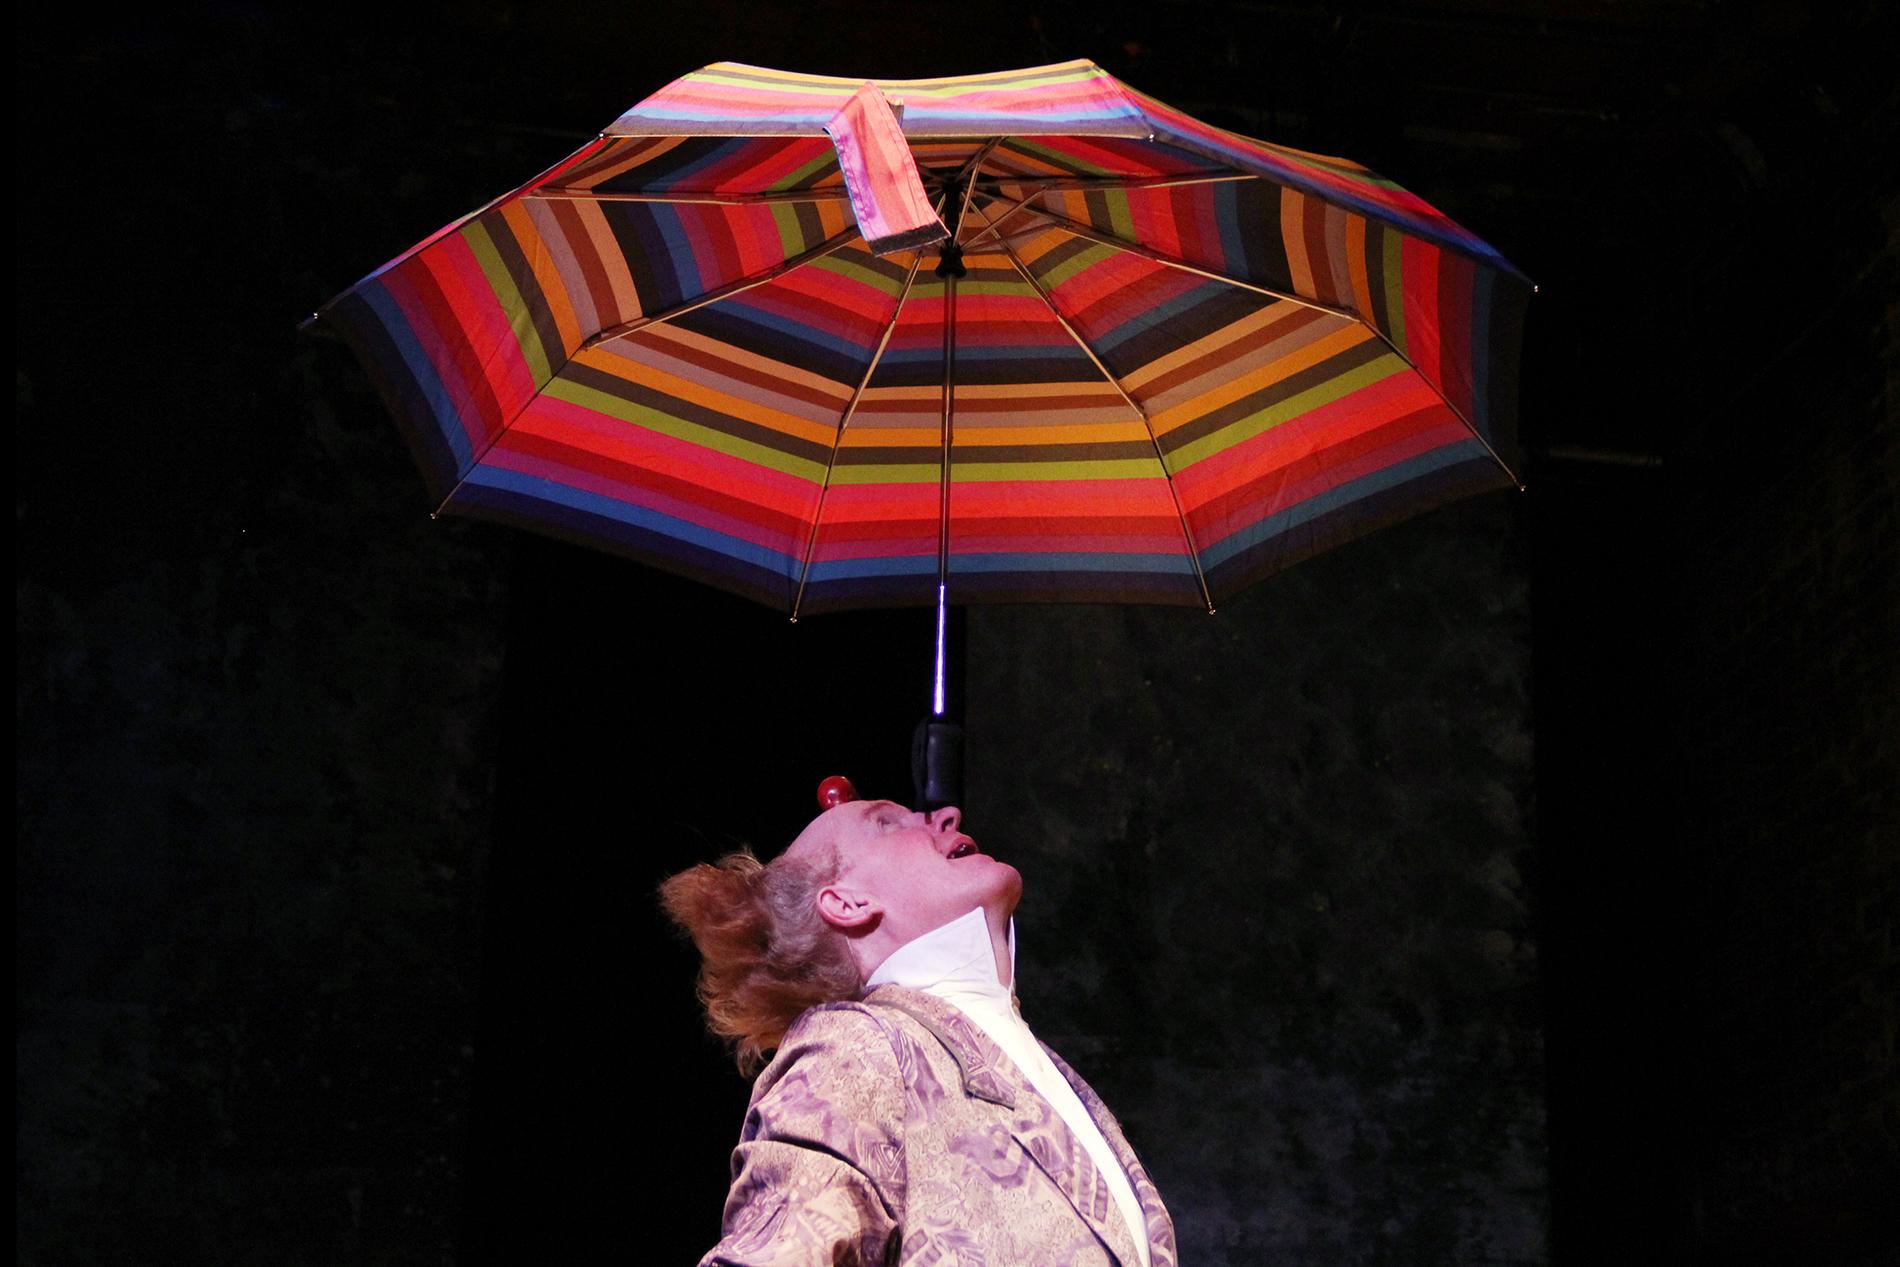 a performer balancing an umbrella on his nose